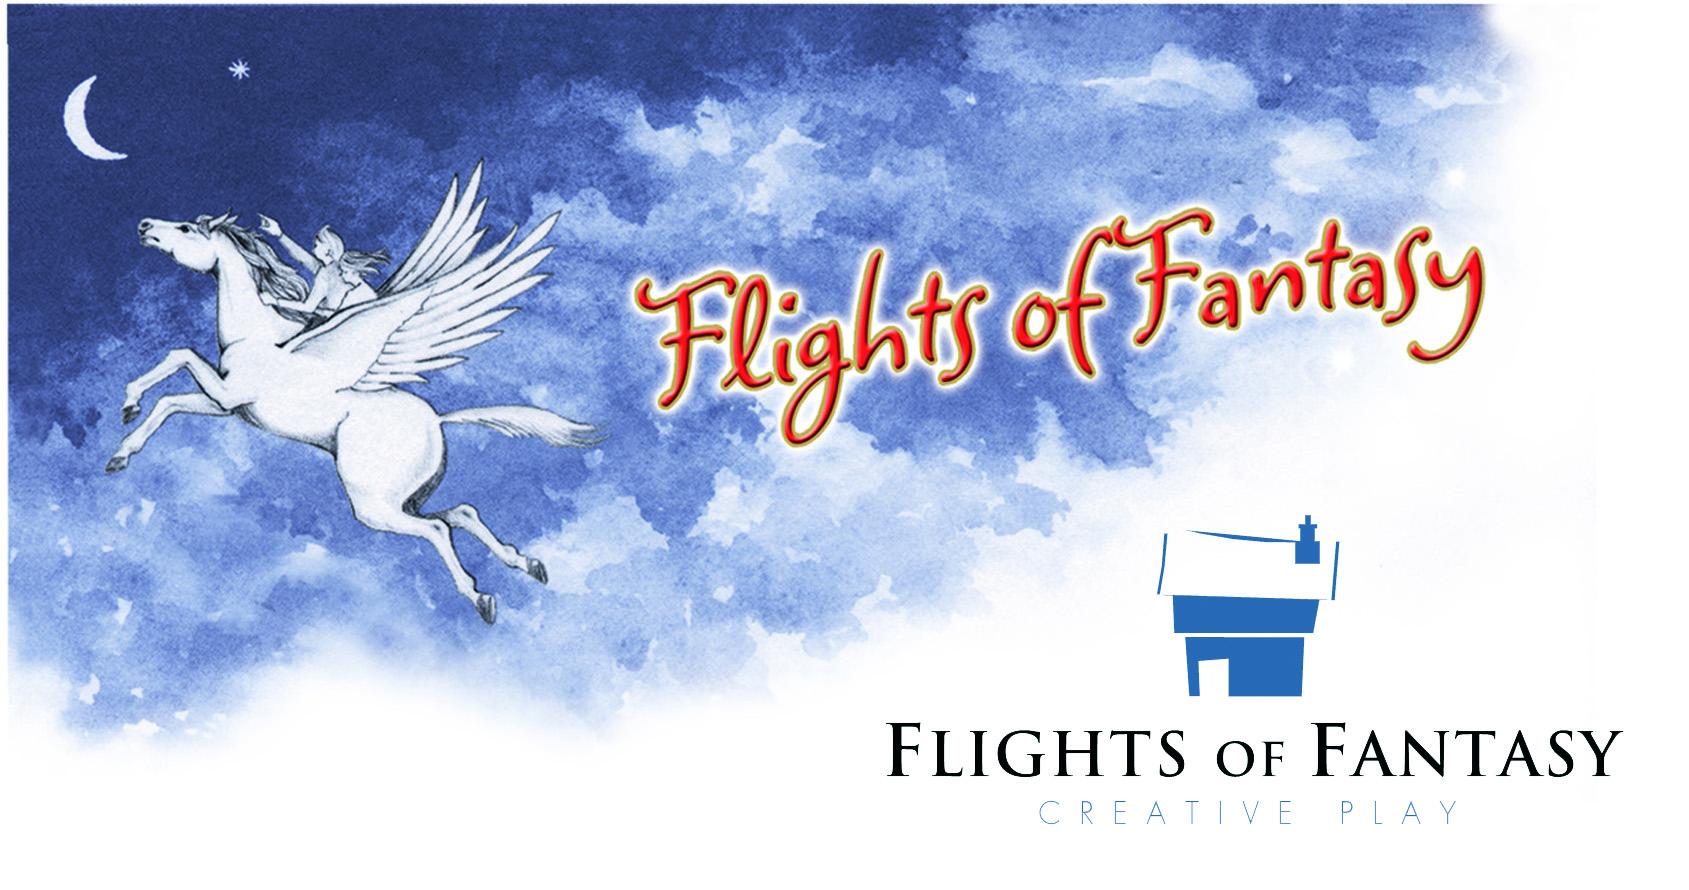 Flights Of Fantasy Old And New Logos